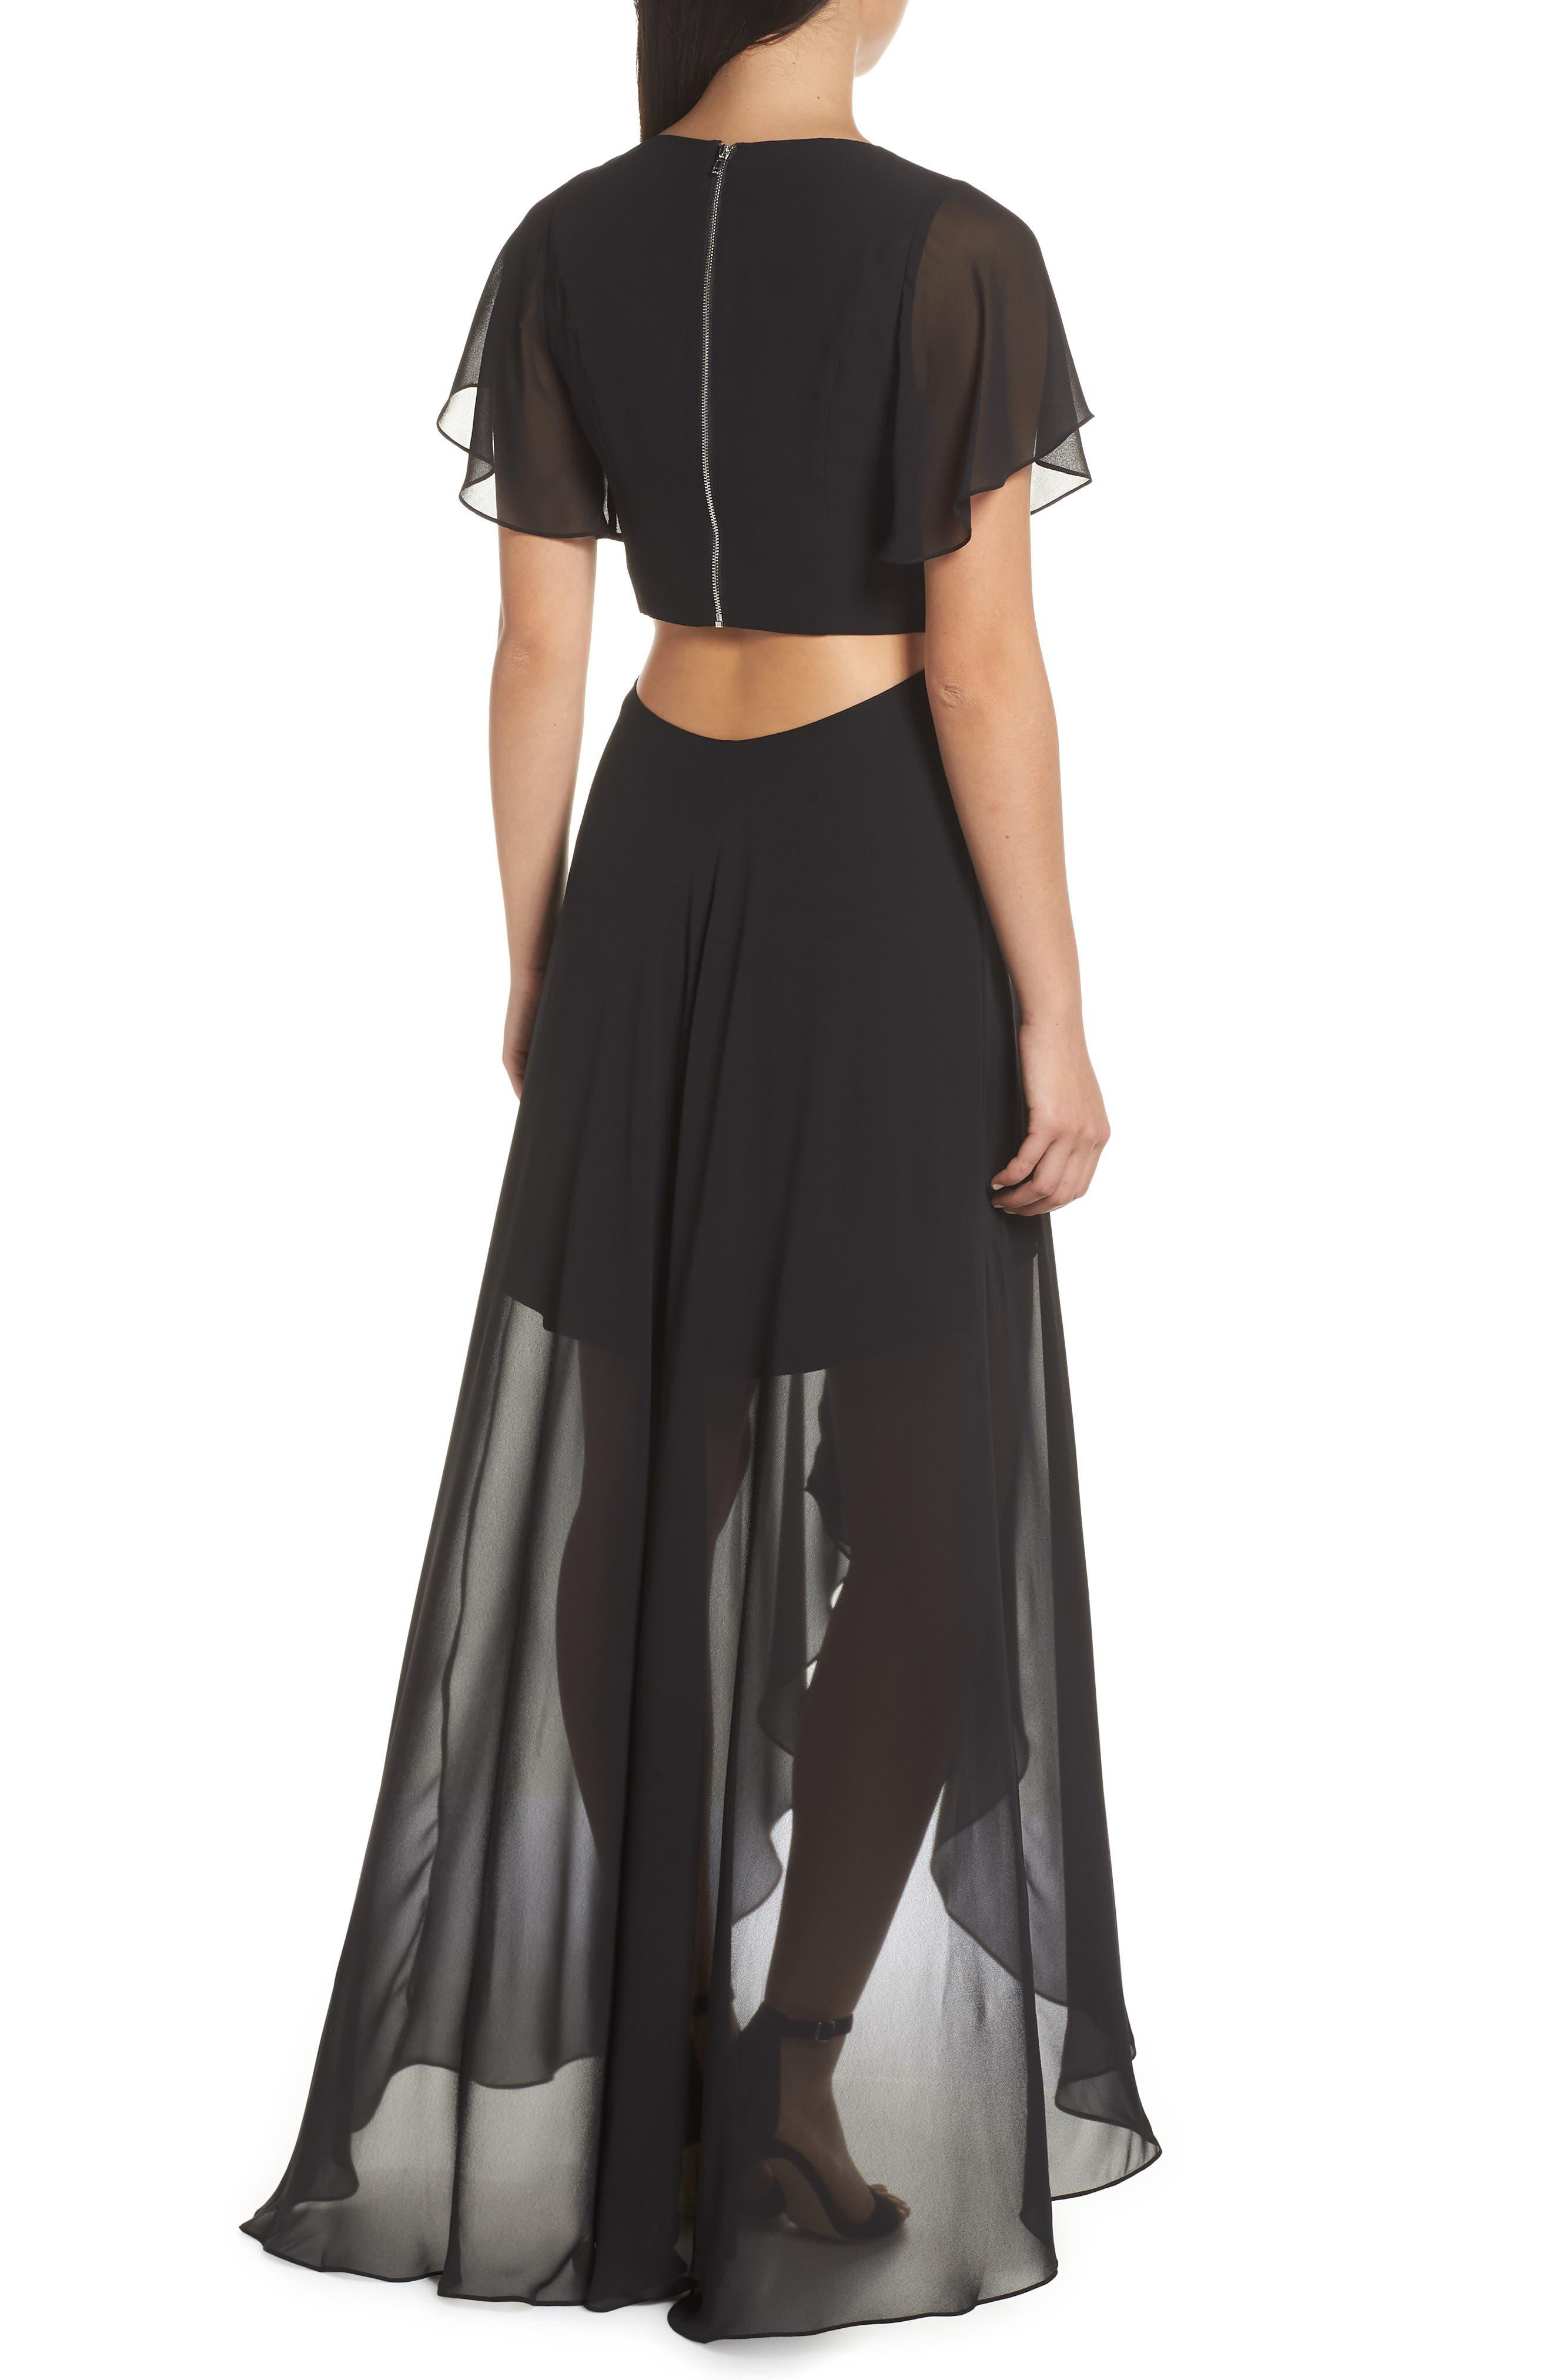 ALI & JAY, Cutout Maxi Dress, Alternate thumbnail 2, color, BLACK